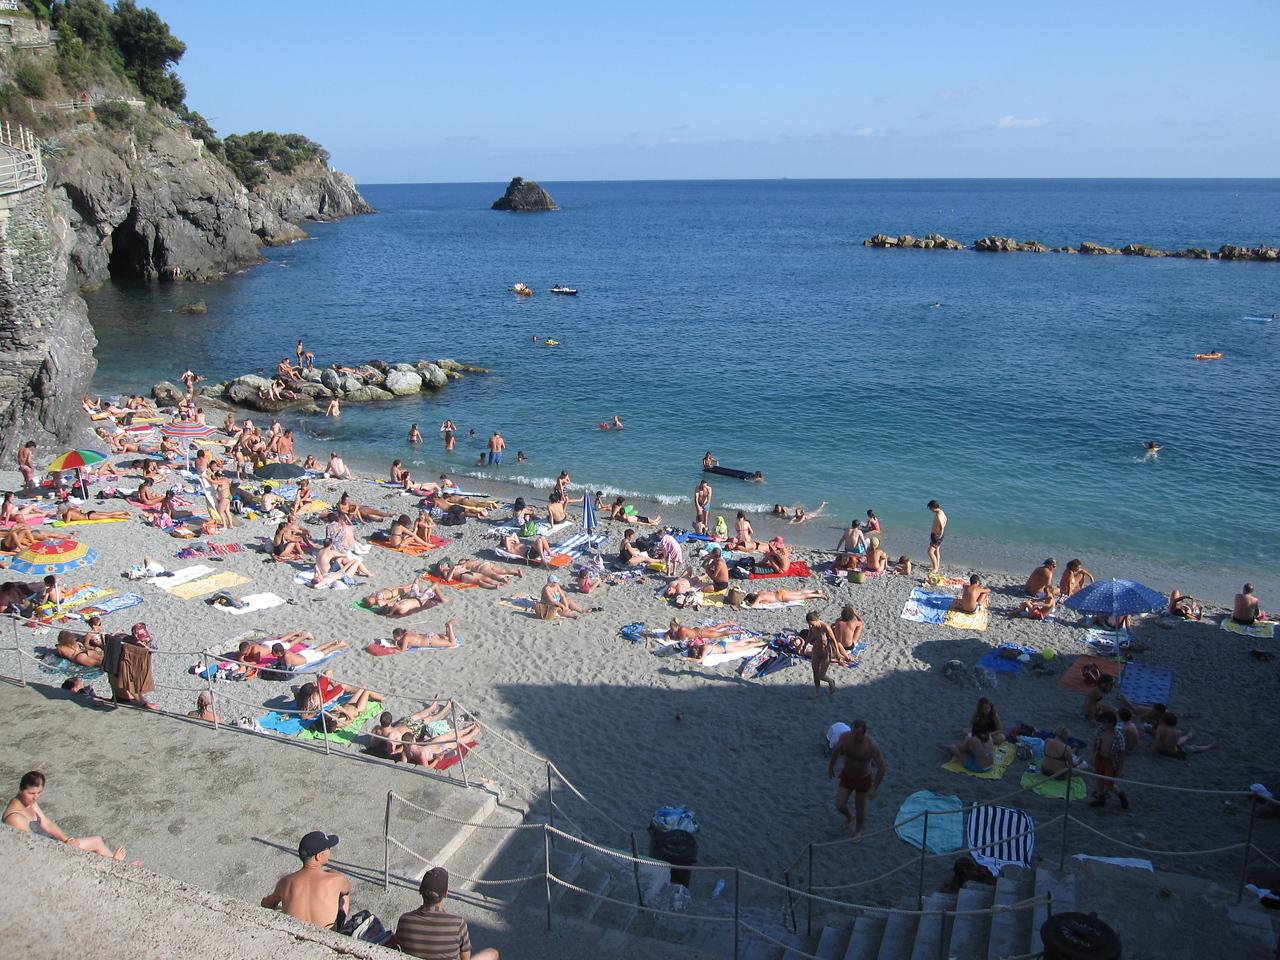 The public beach in Monterosso where we took a dip in the Mediterranean.